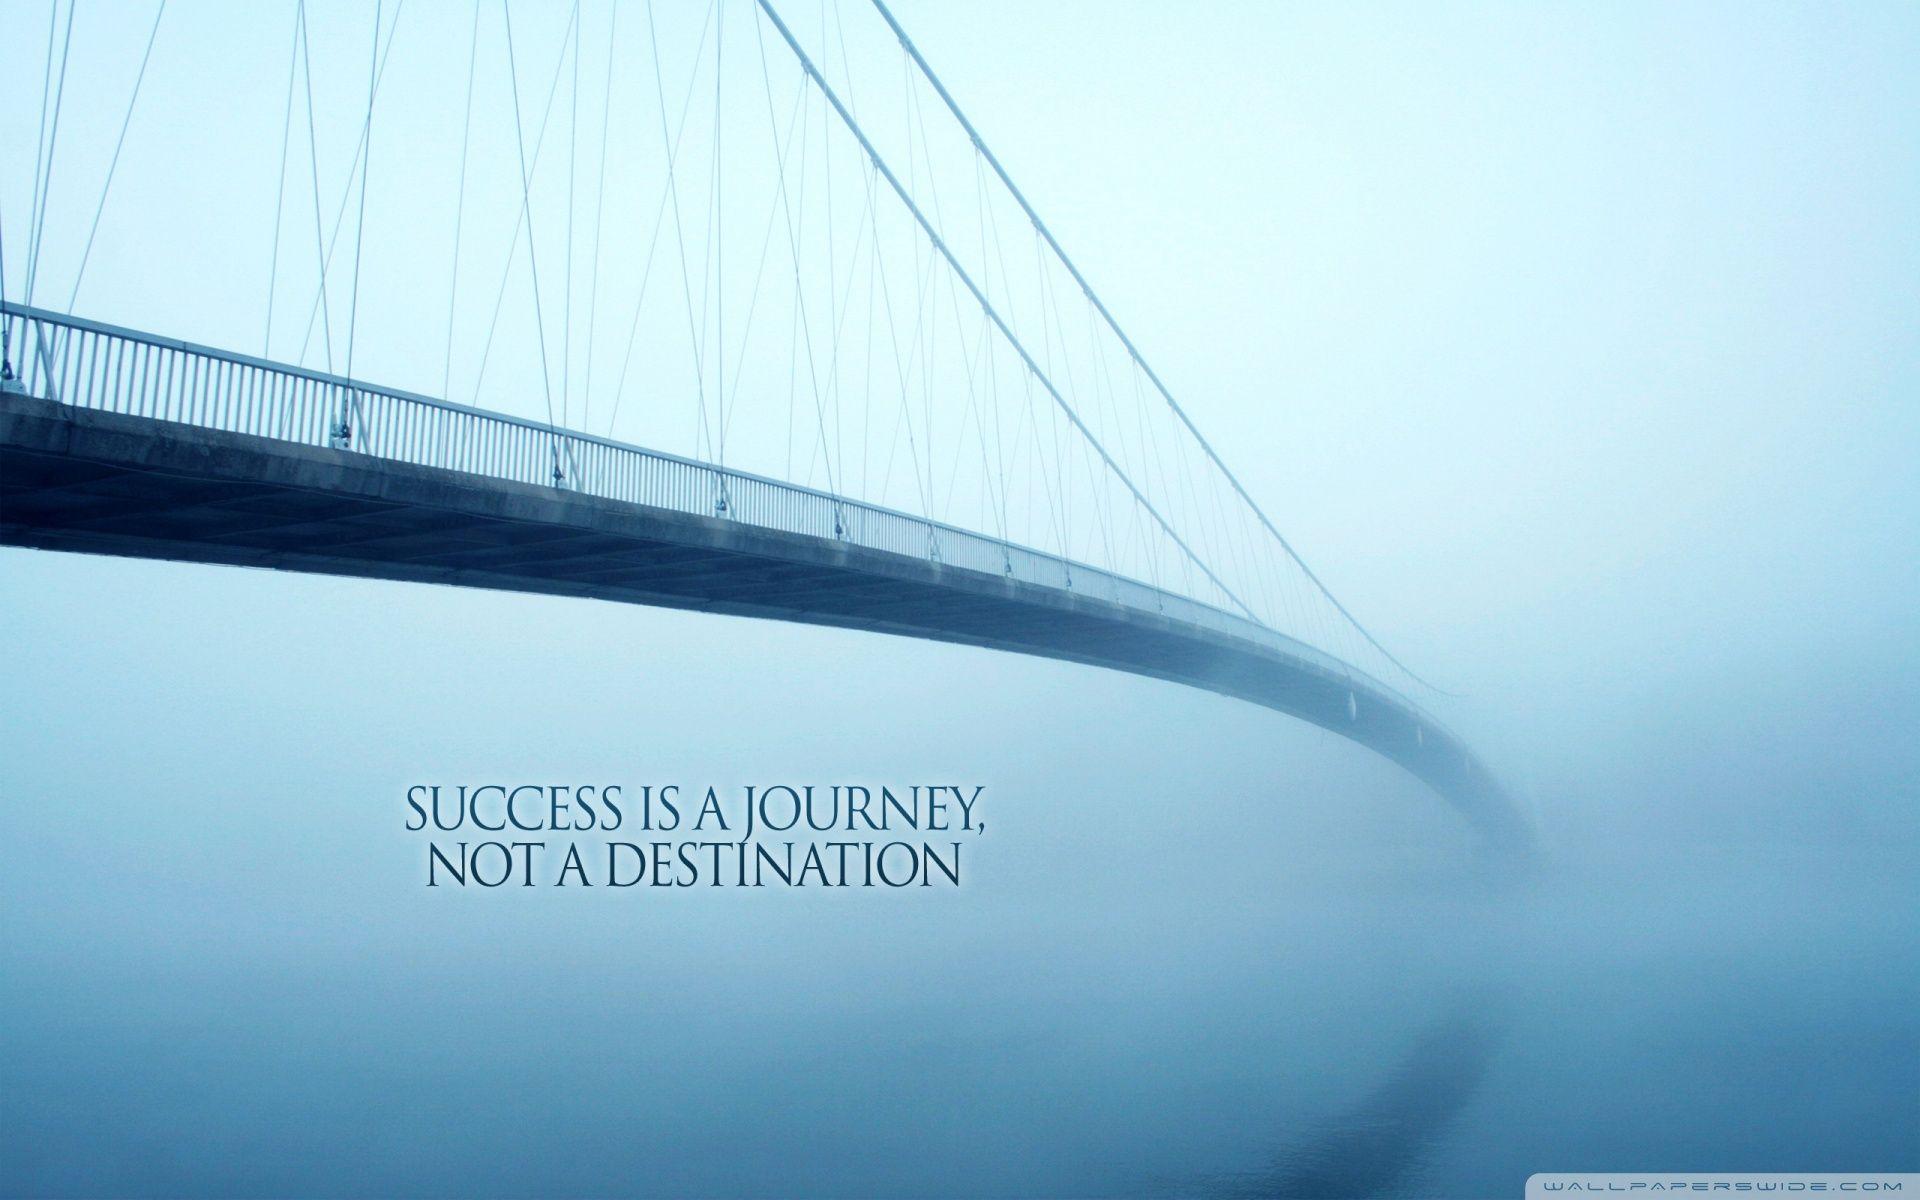 Success Quotes Hd Desktop Wallpaper High Definition Fullscreen Inspirational Quotes Wallpapers Inspirational Wallpapers Motivational Wallpaper